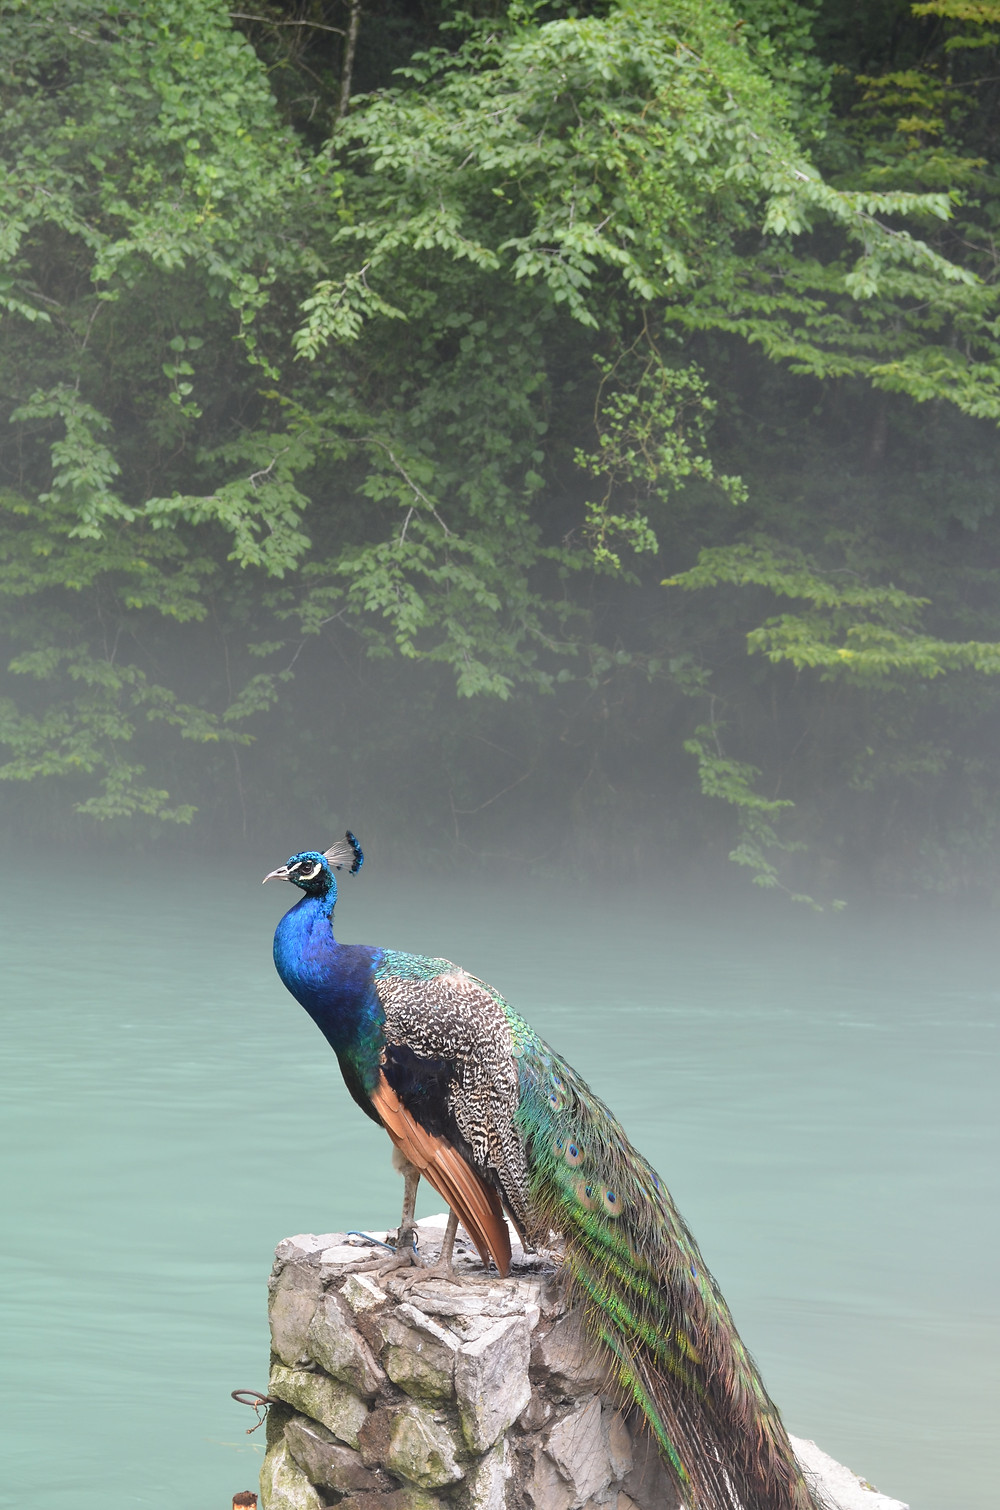 Wildlife in Abkhazia